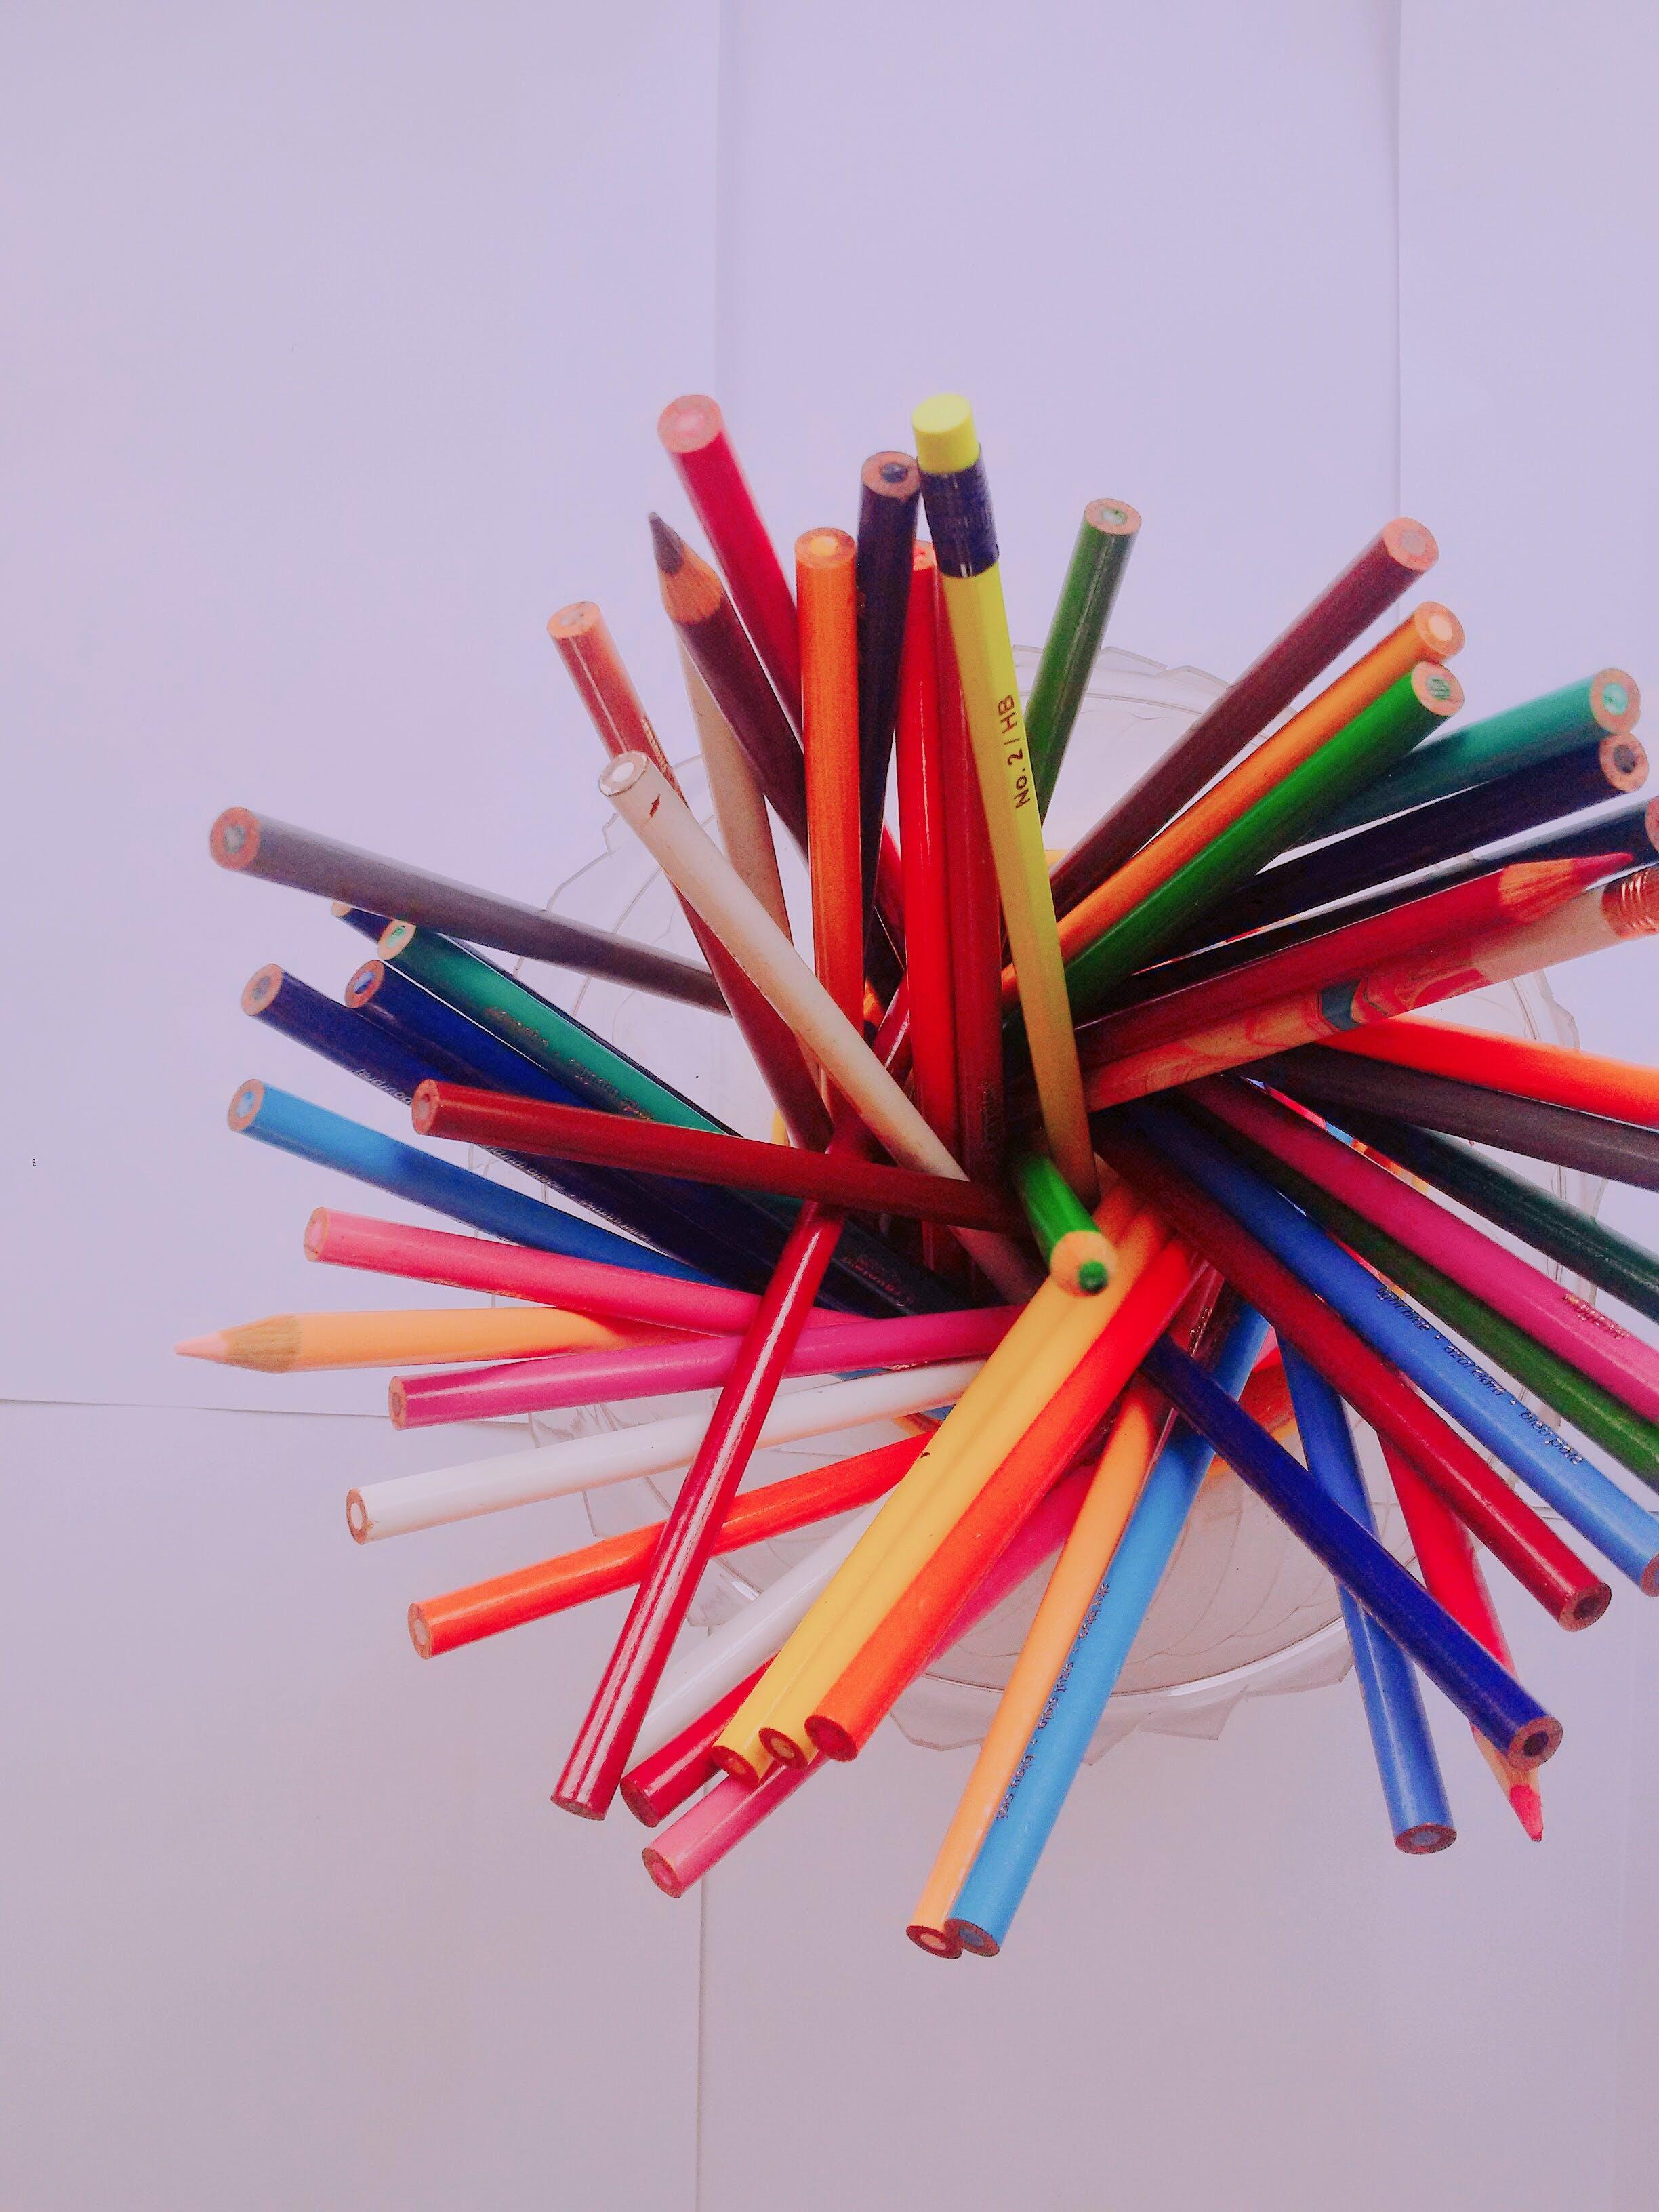 Free stock photo of C, crayons